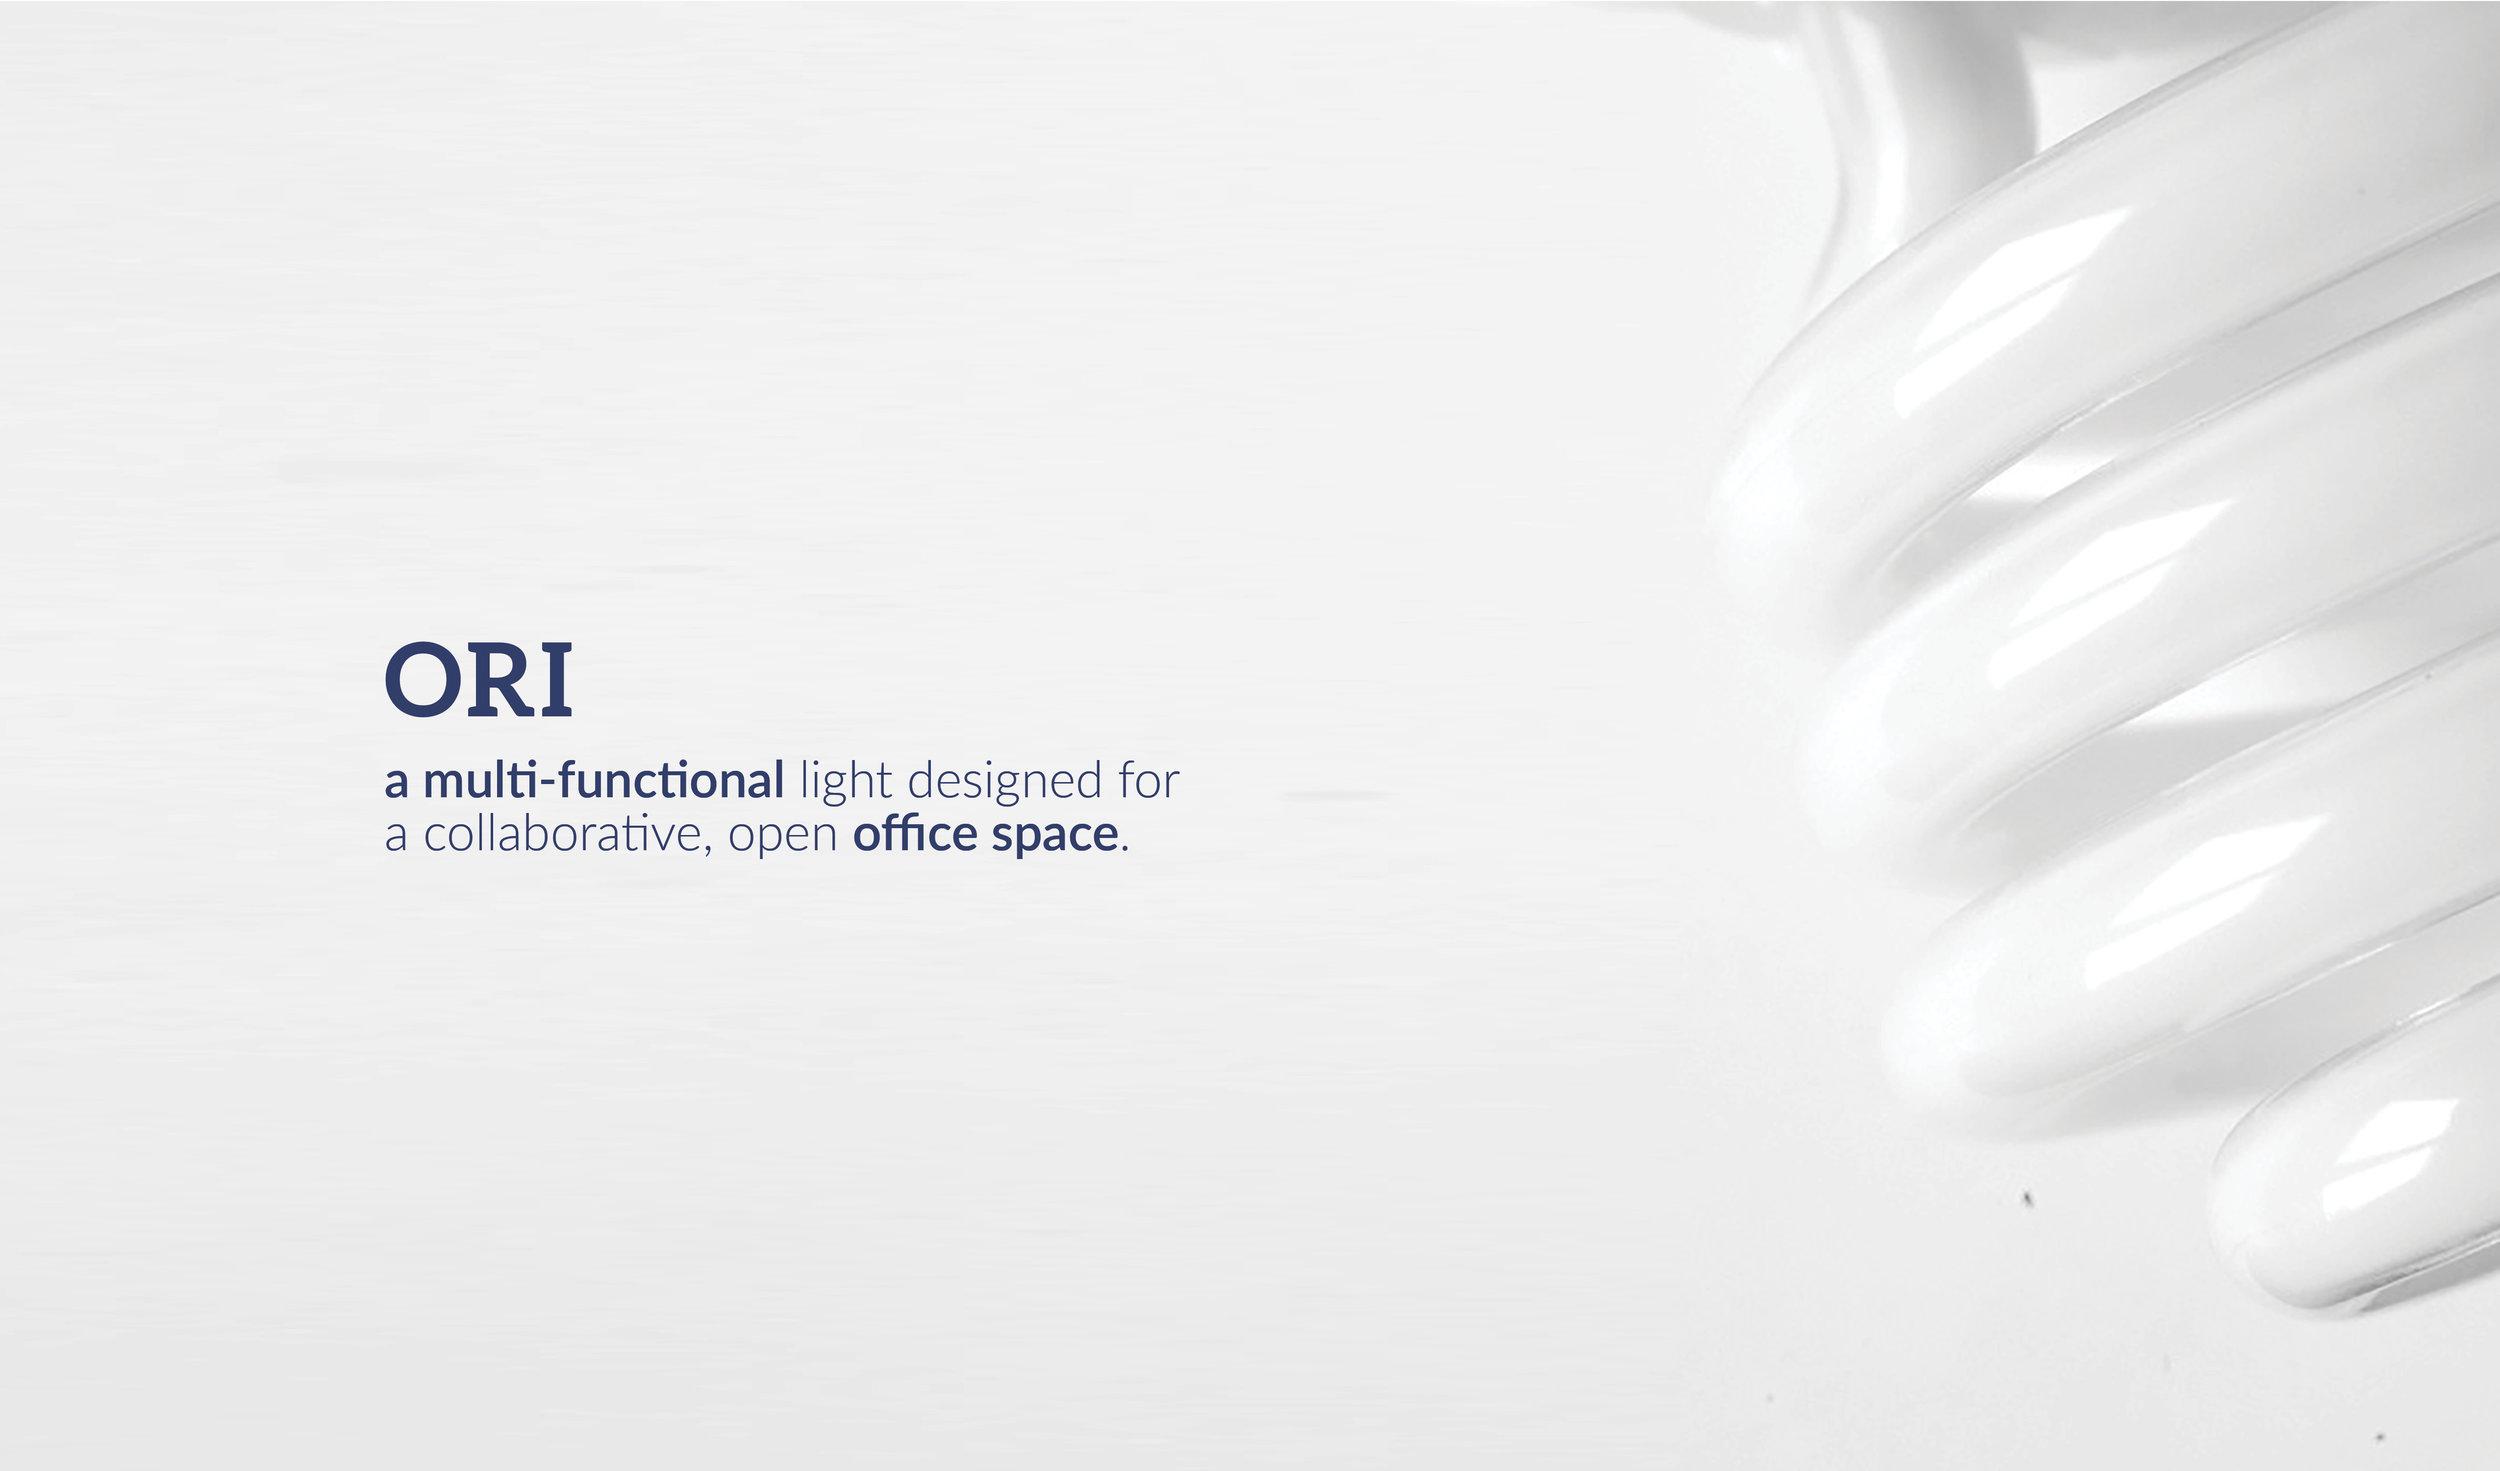 02.21.18_Squarespace_Ori.jpg